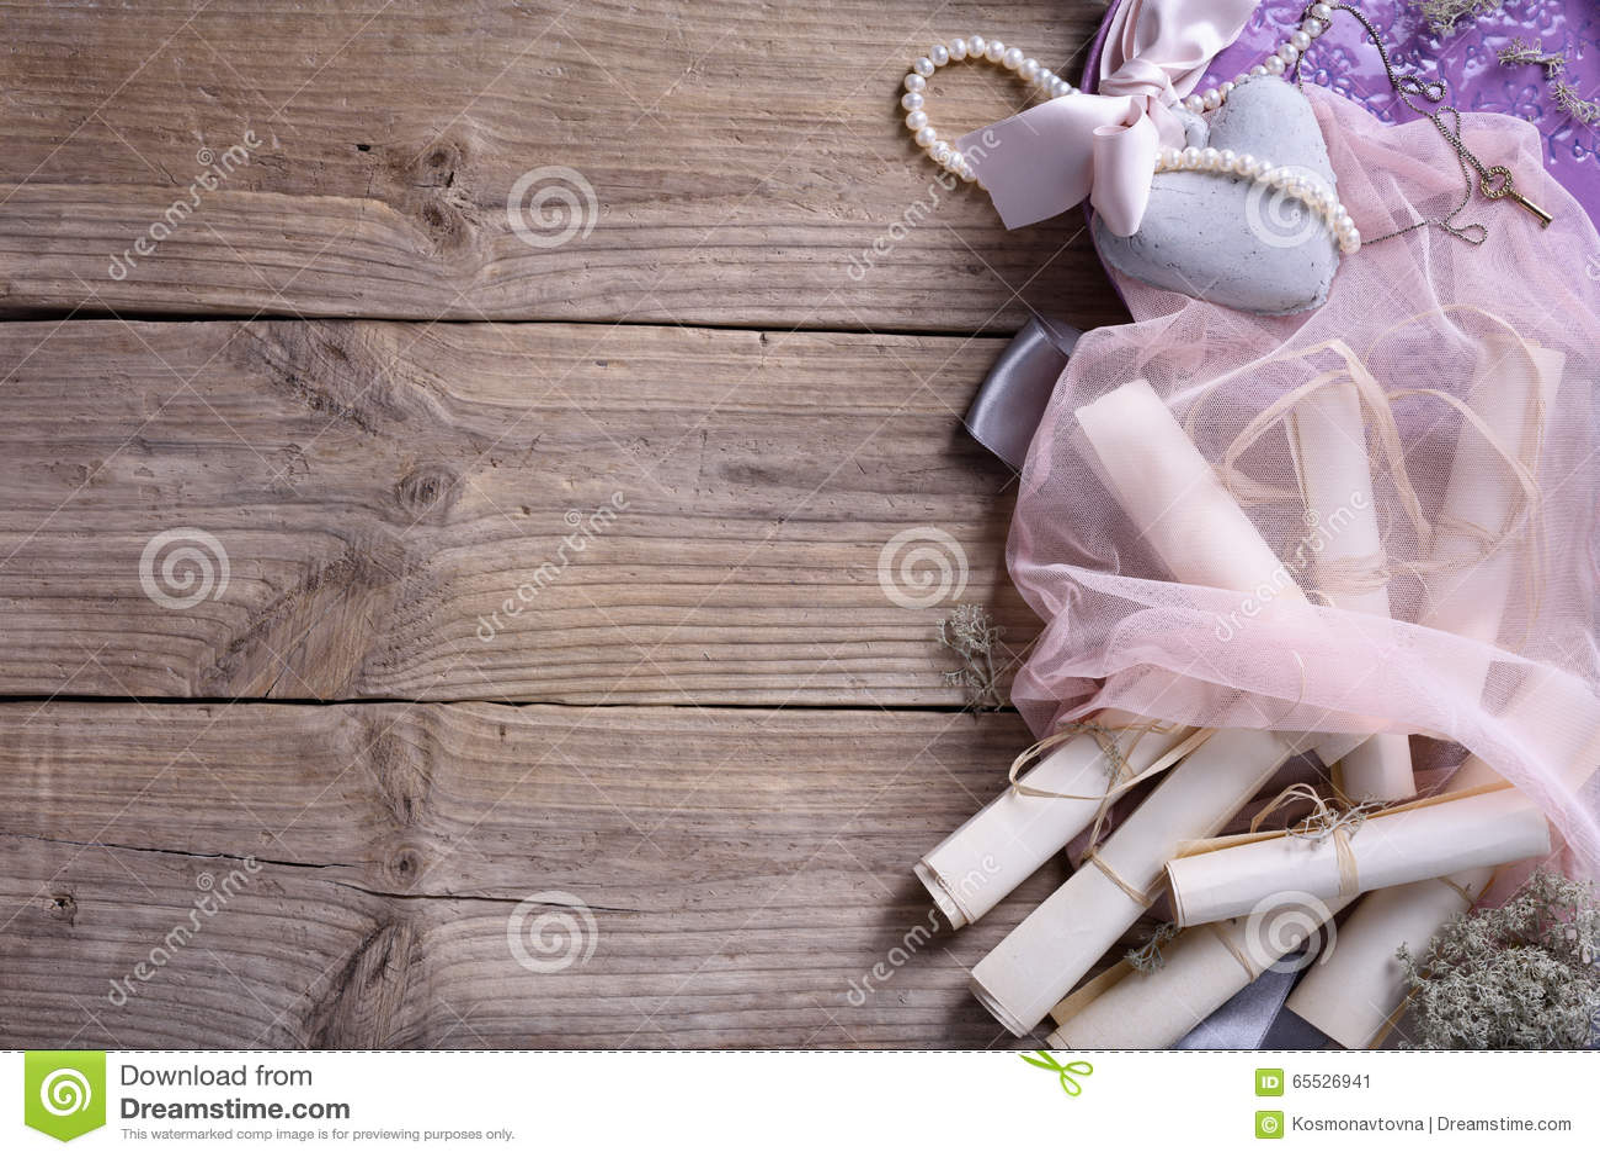 wedding accessories ceramic heart vintage invitation scrolls pink